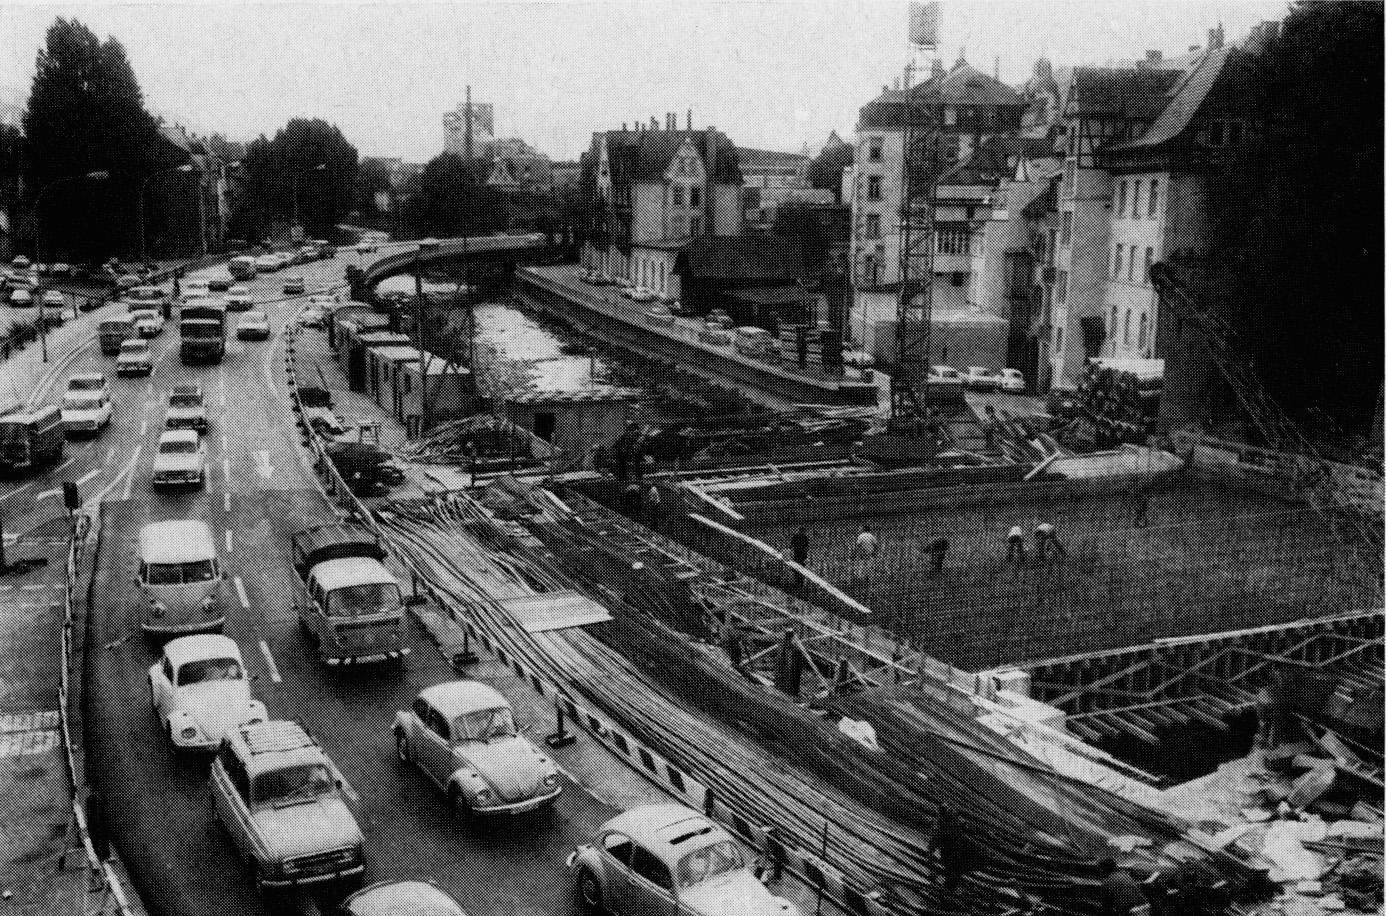 Schwabentorbrücke_Freiburg_1970er